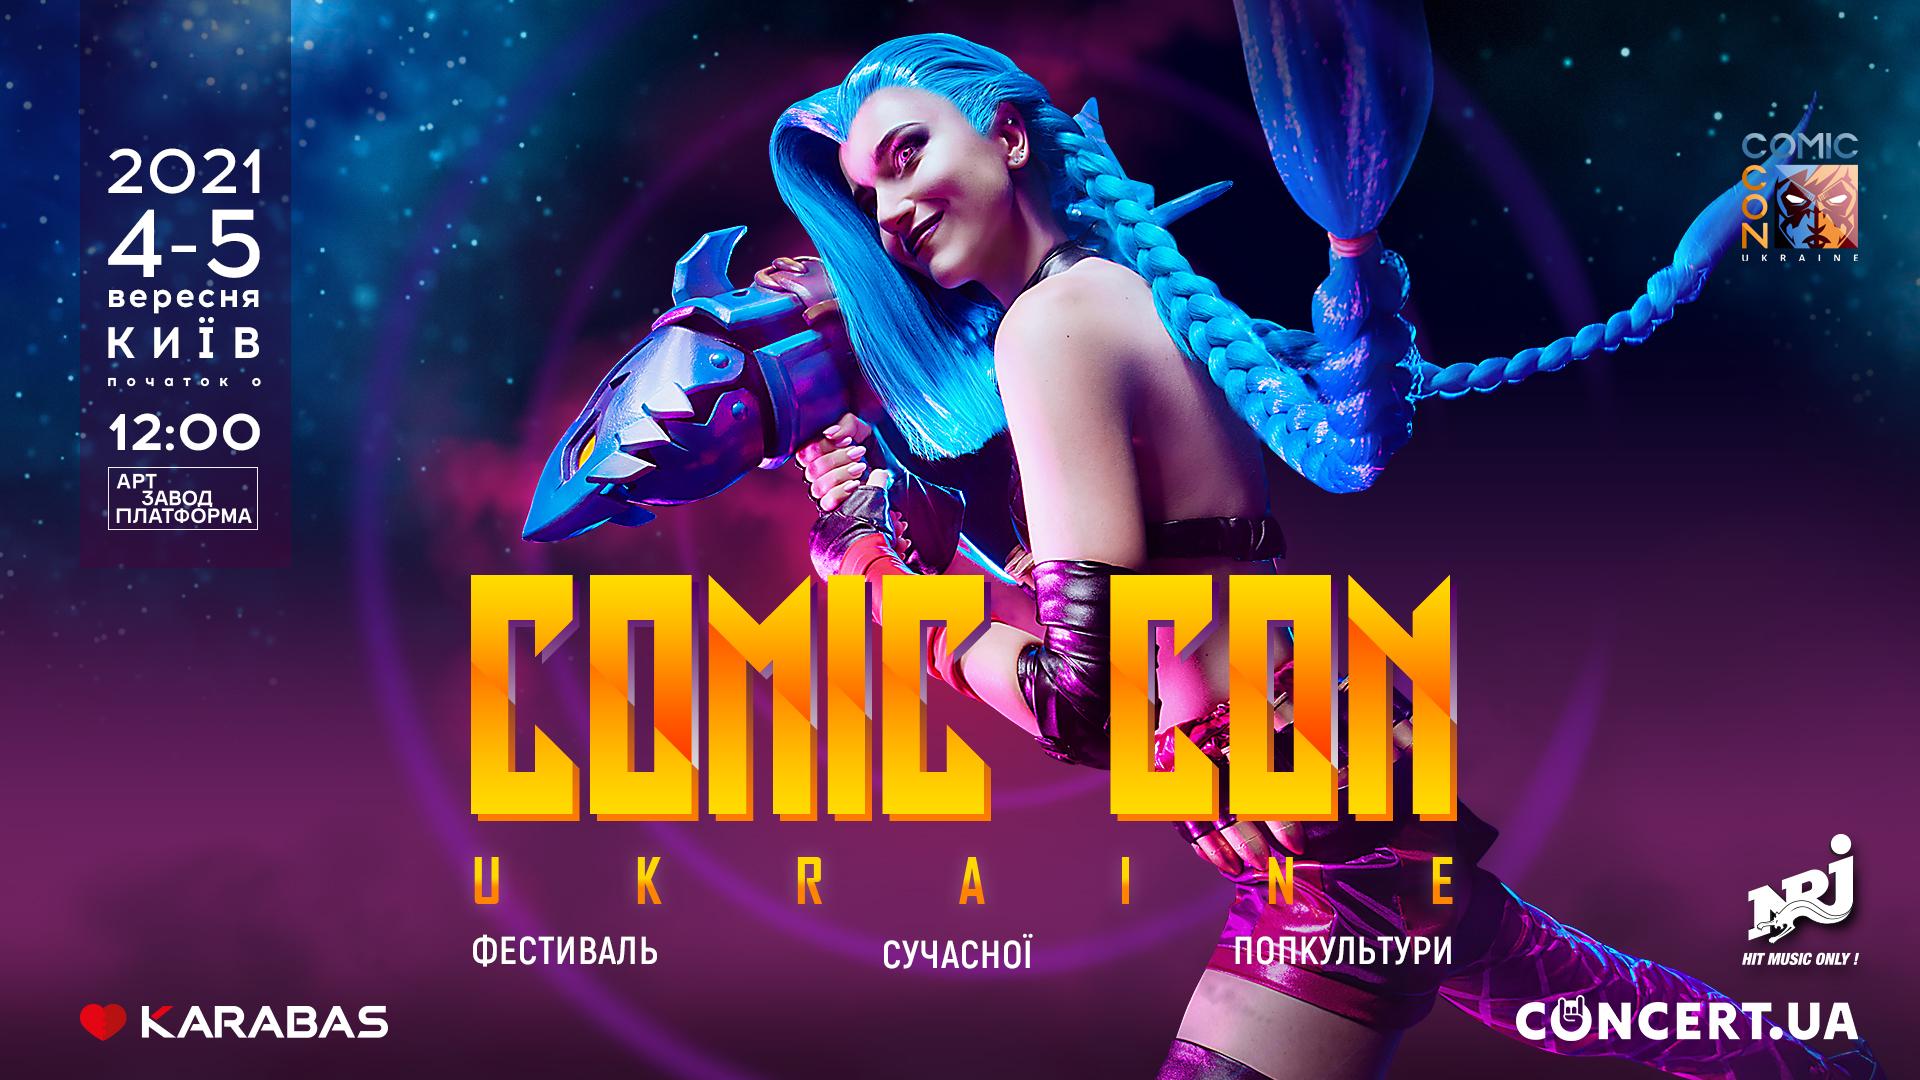 афиша мероприятий, Comic Con 2021